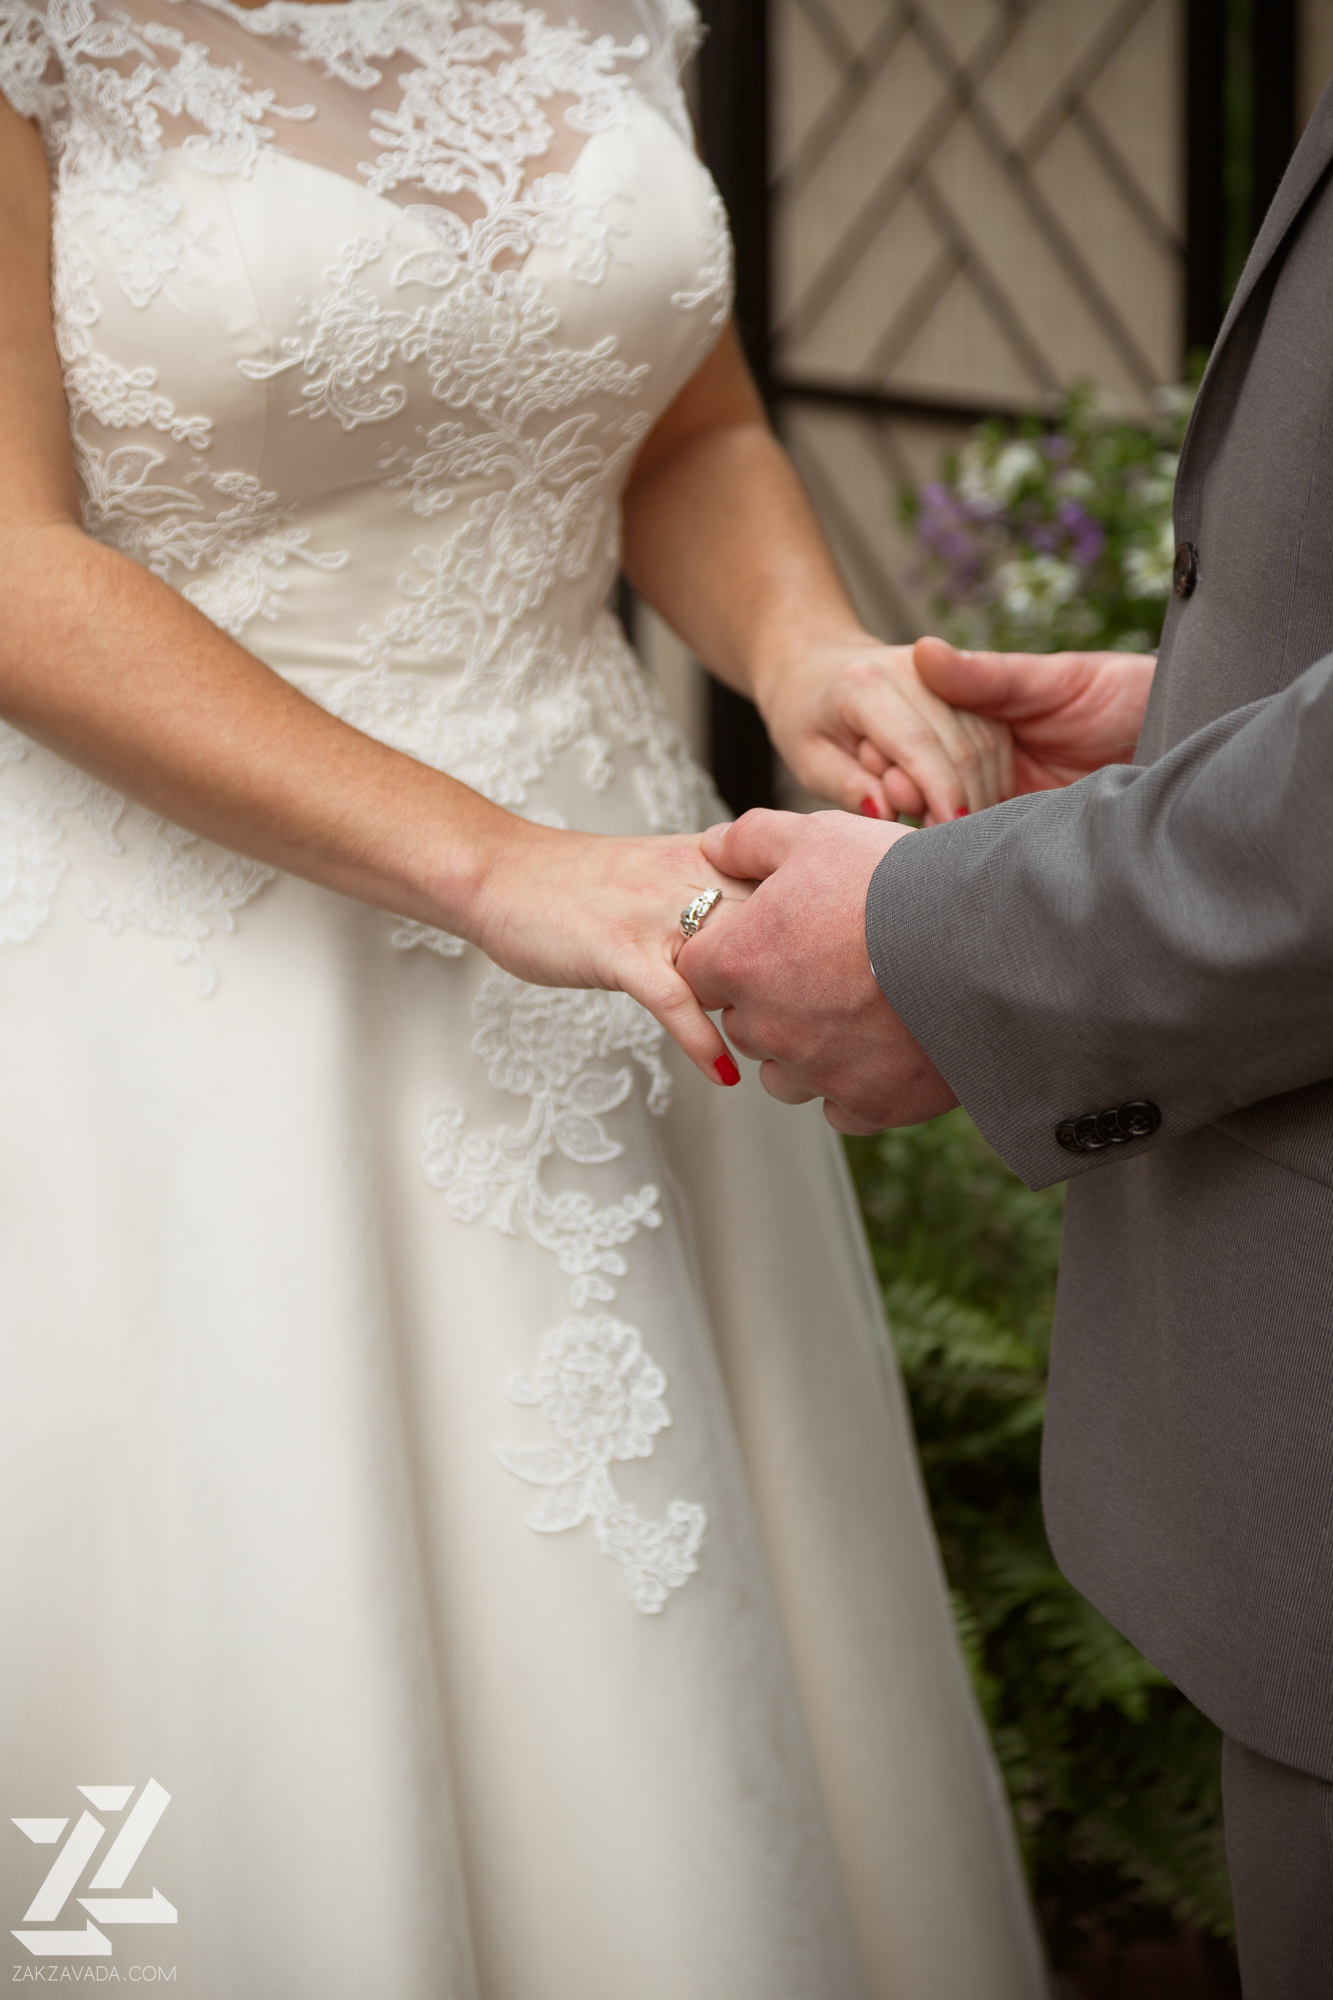 scranton-wedding-photography-zak-zavada-meganJonathan-234.jpg